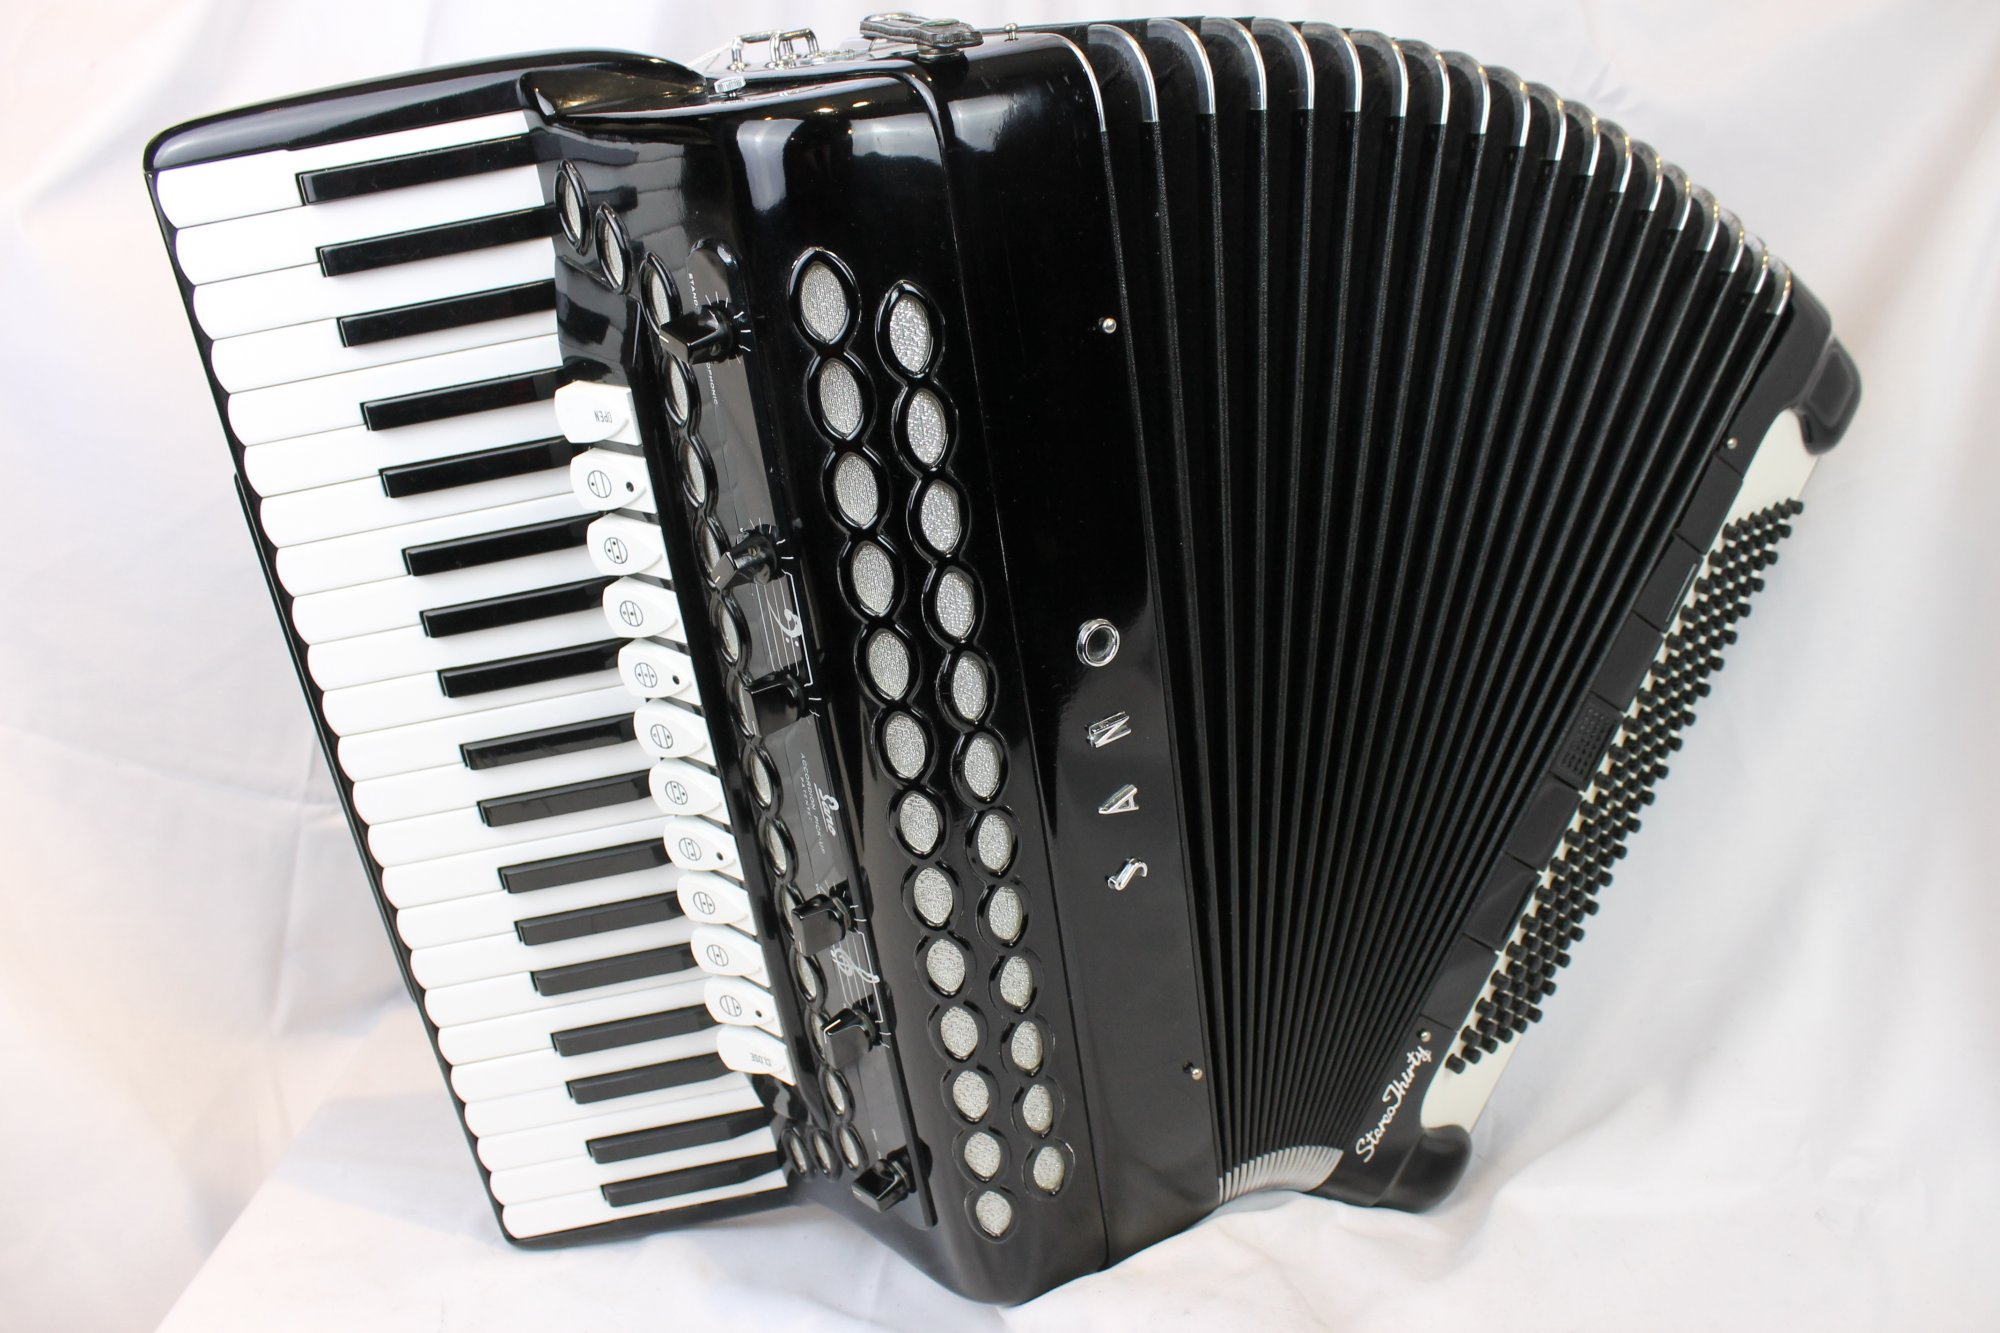 4056 - Black Sano Stereo Thirty Piano Accordion LMMH 41 120